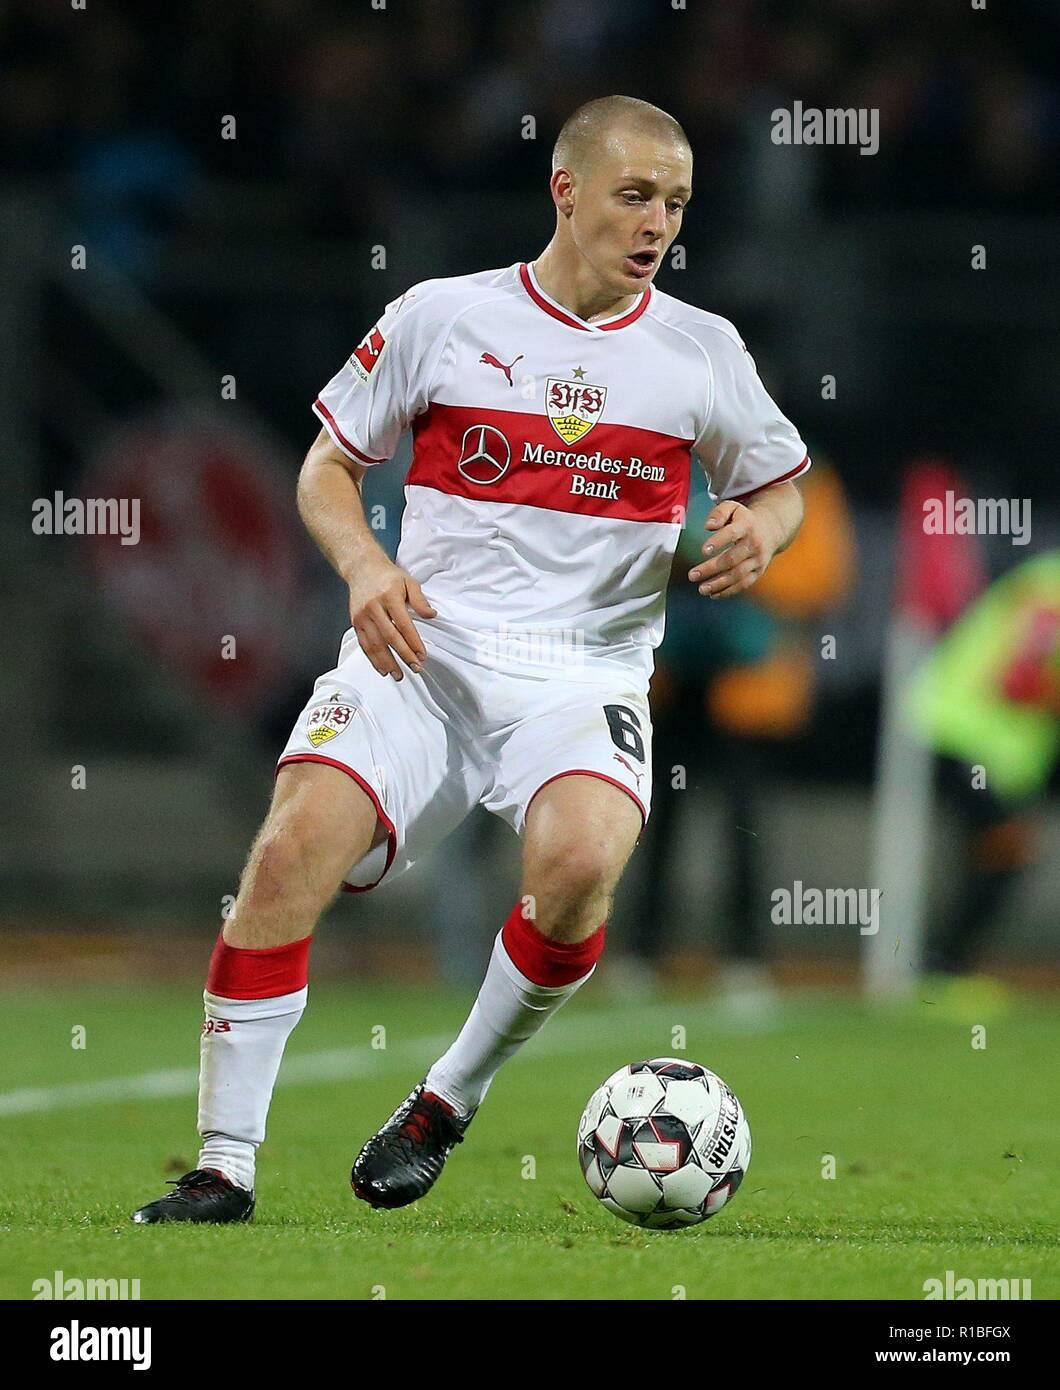 firo: 10.11.2018, Fuvuball, 1.Bundesliga, season 2018/2019, 1.FC Nvºrnberg - VFB Stuttgart 0: 2, Santiago Ascacibar, VFB, Stuttgart, VFB Stuttgart, single action | usage worldwide - Stock Image